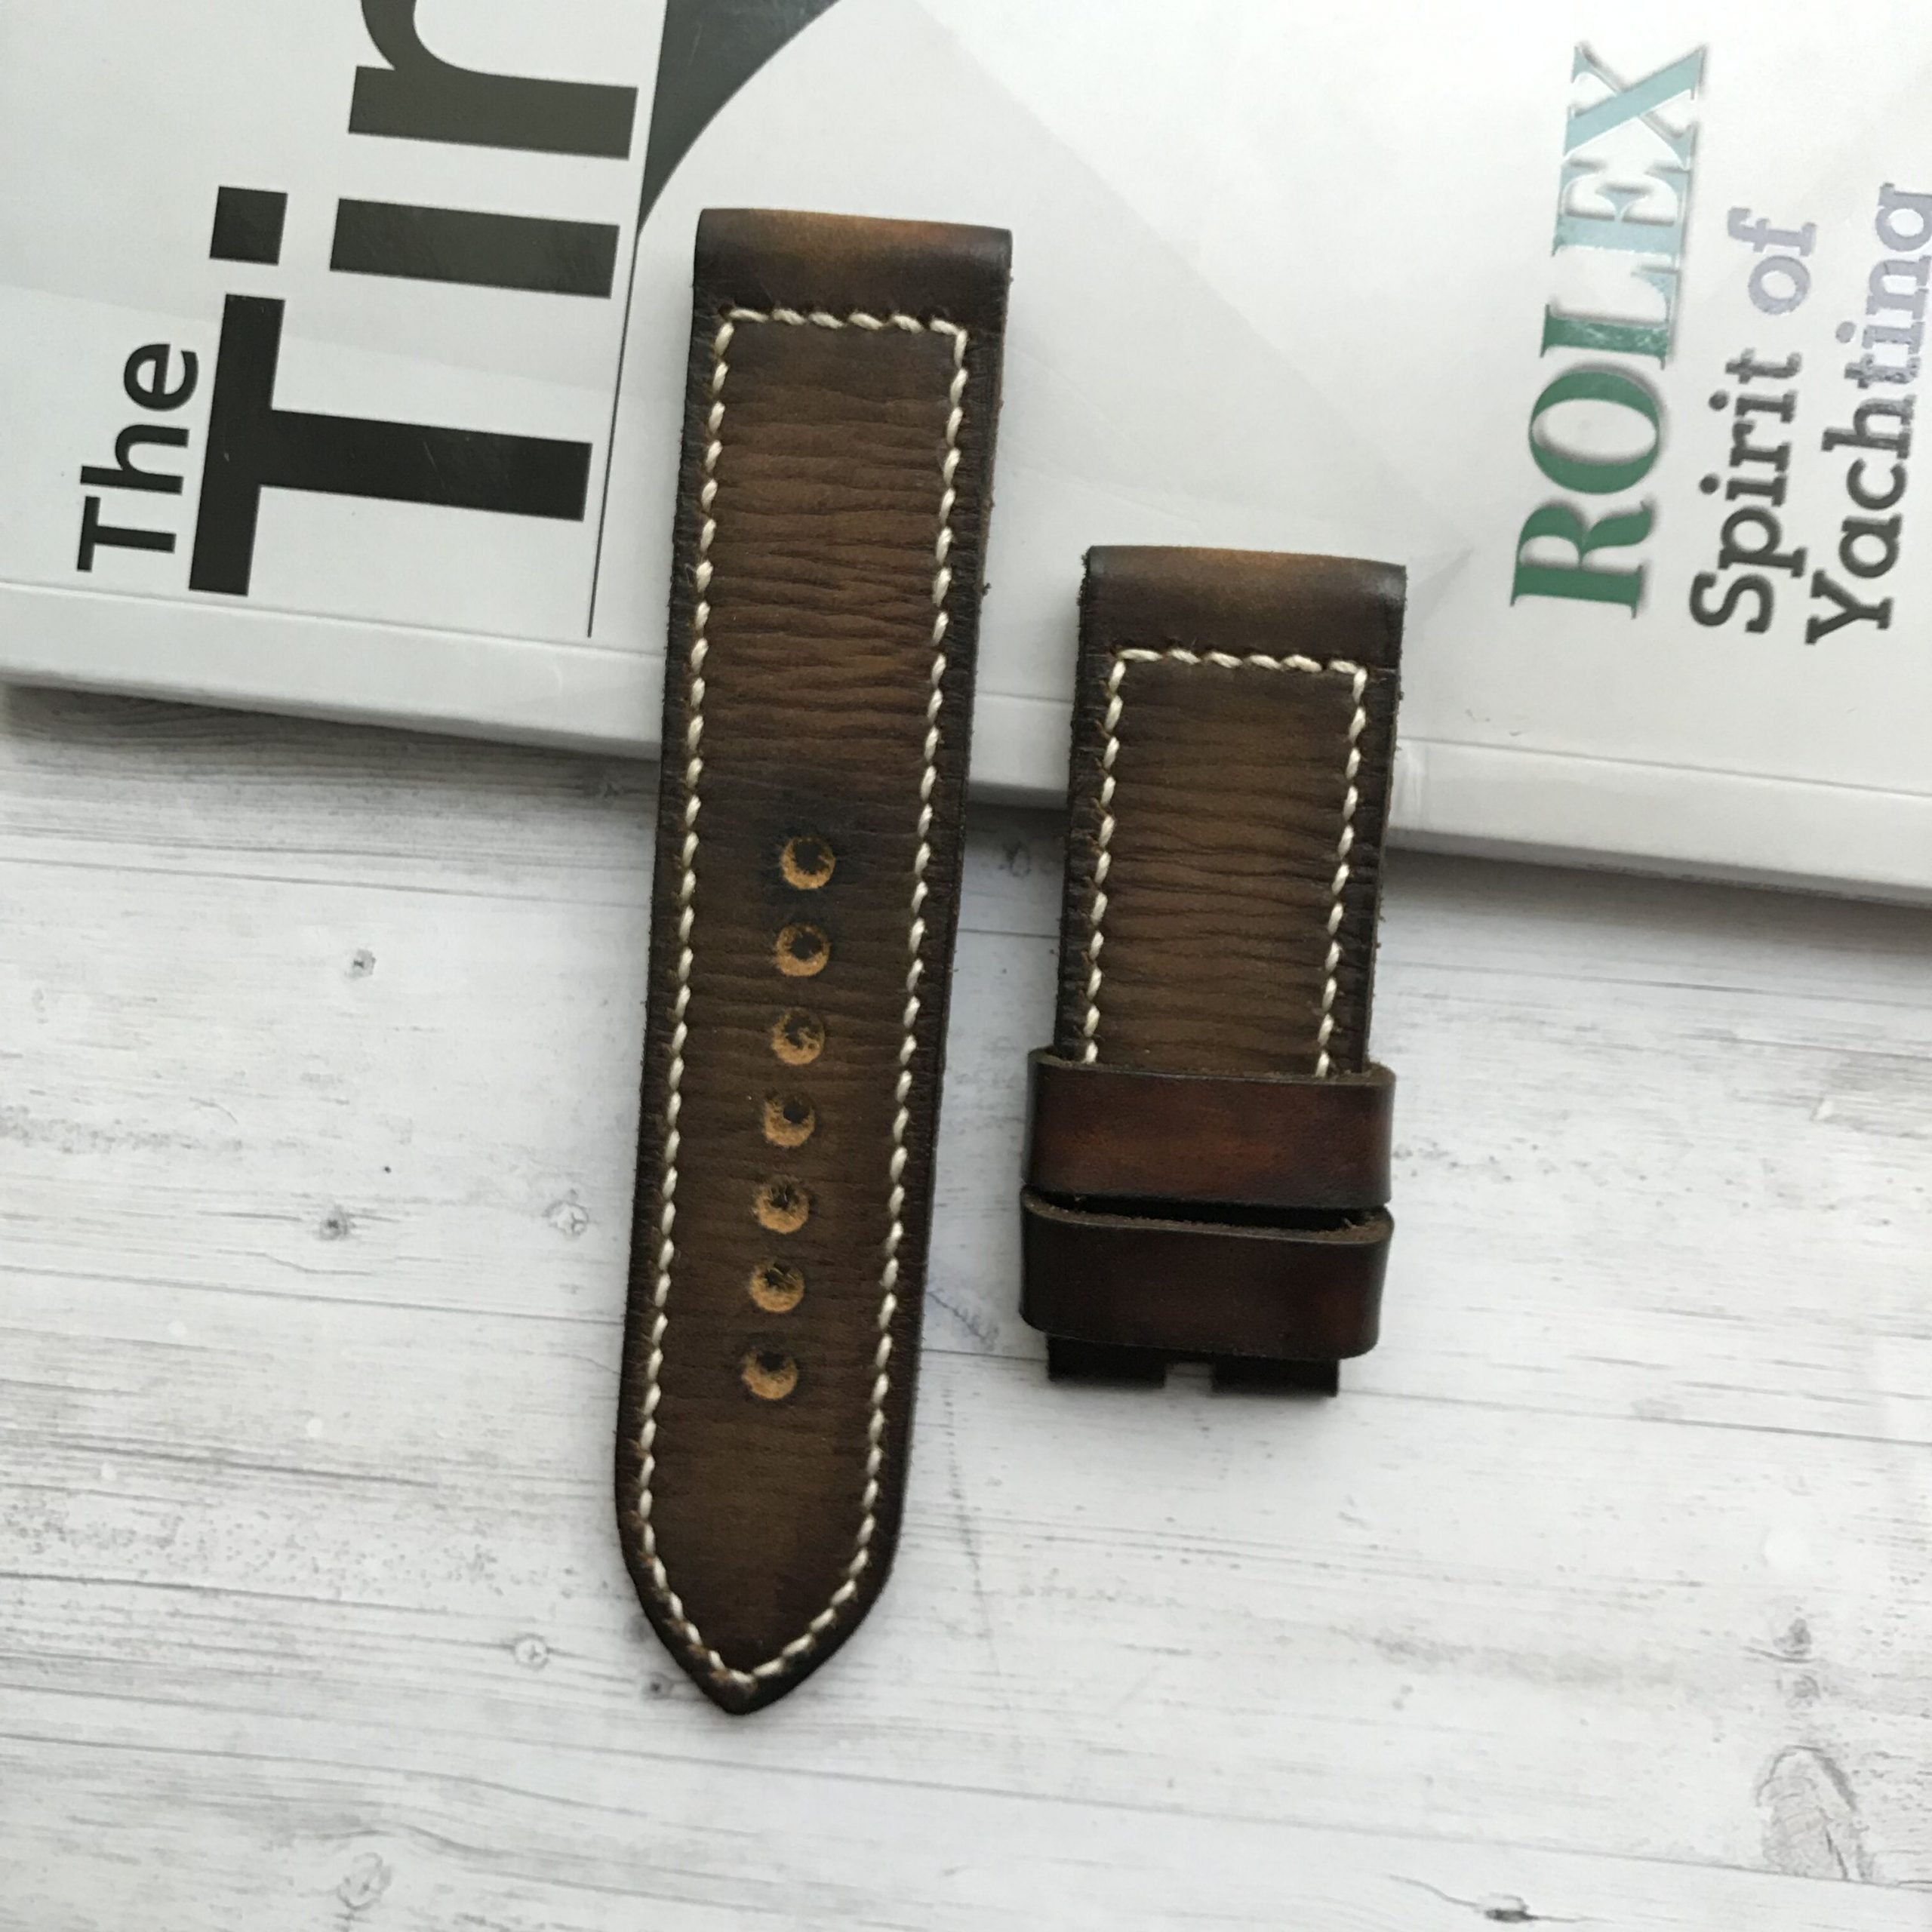 porteur-straps-ballanpines-strapsonly